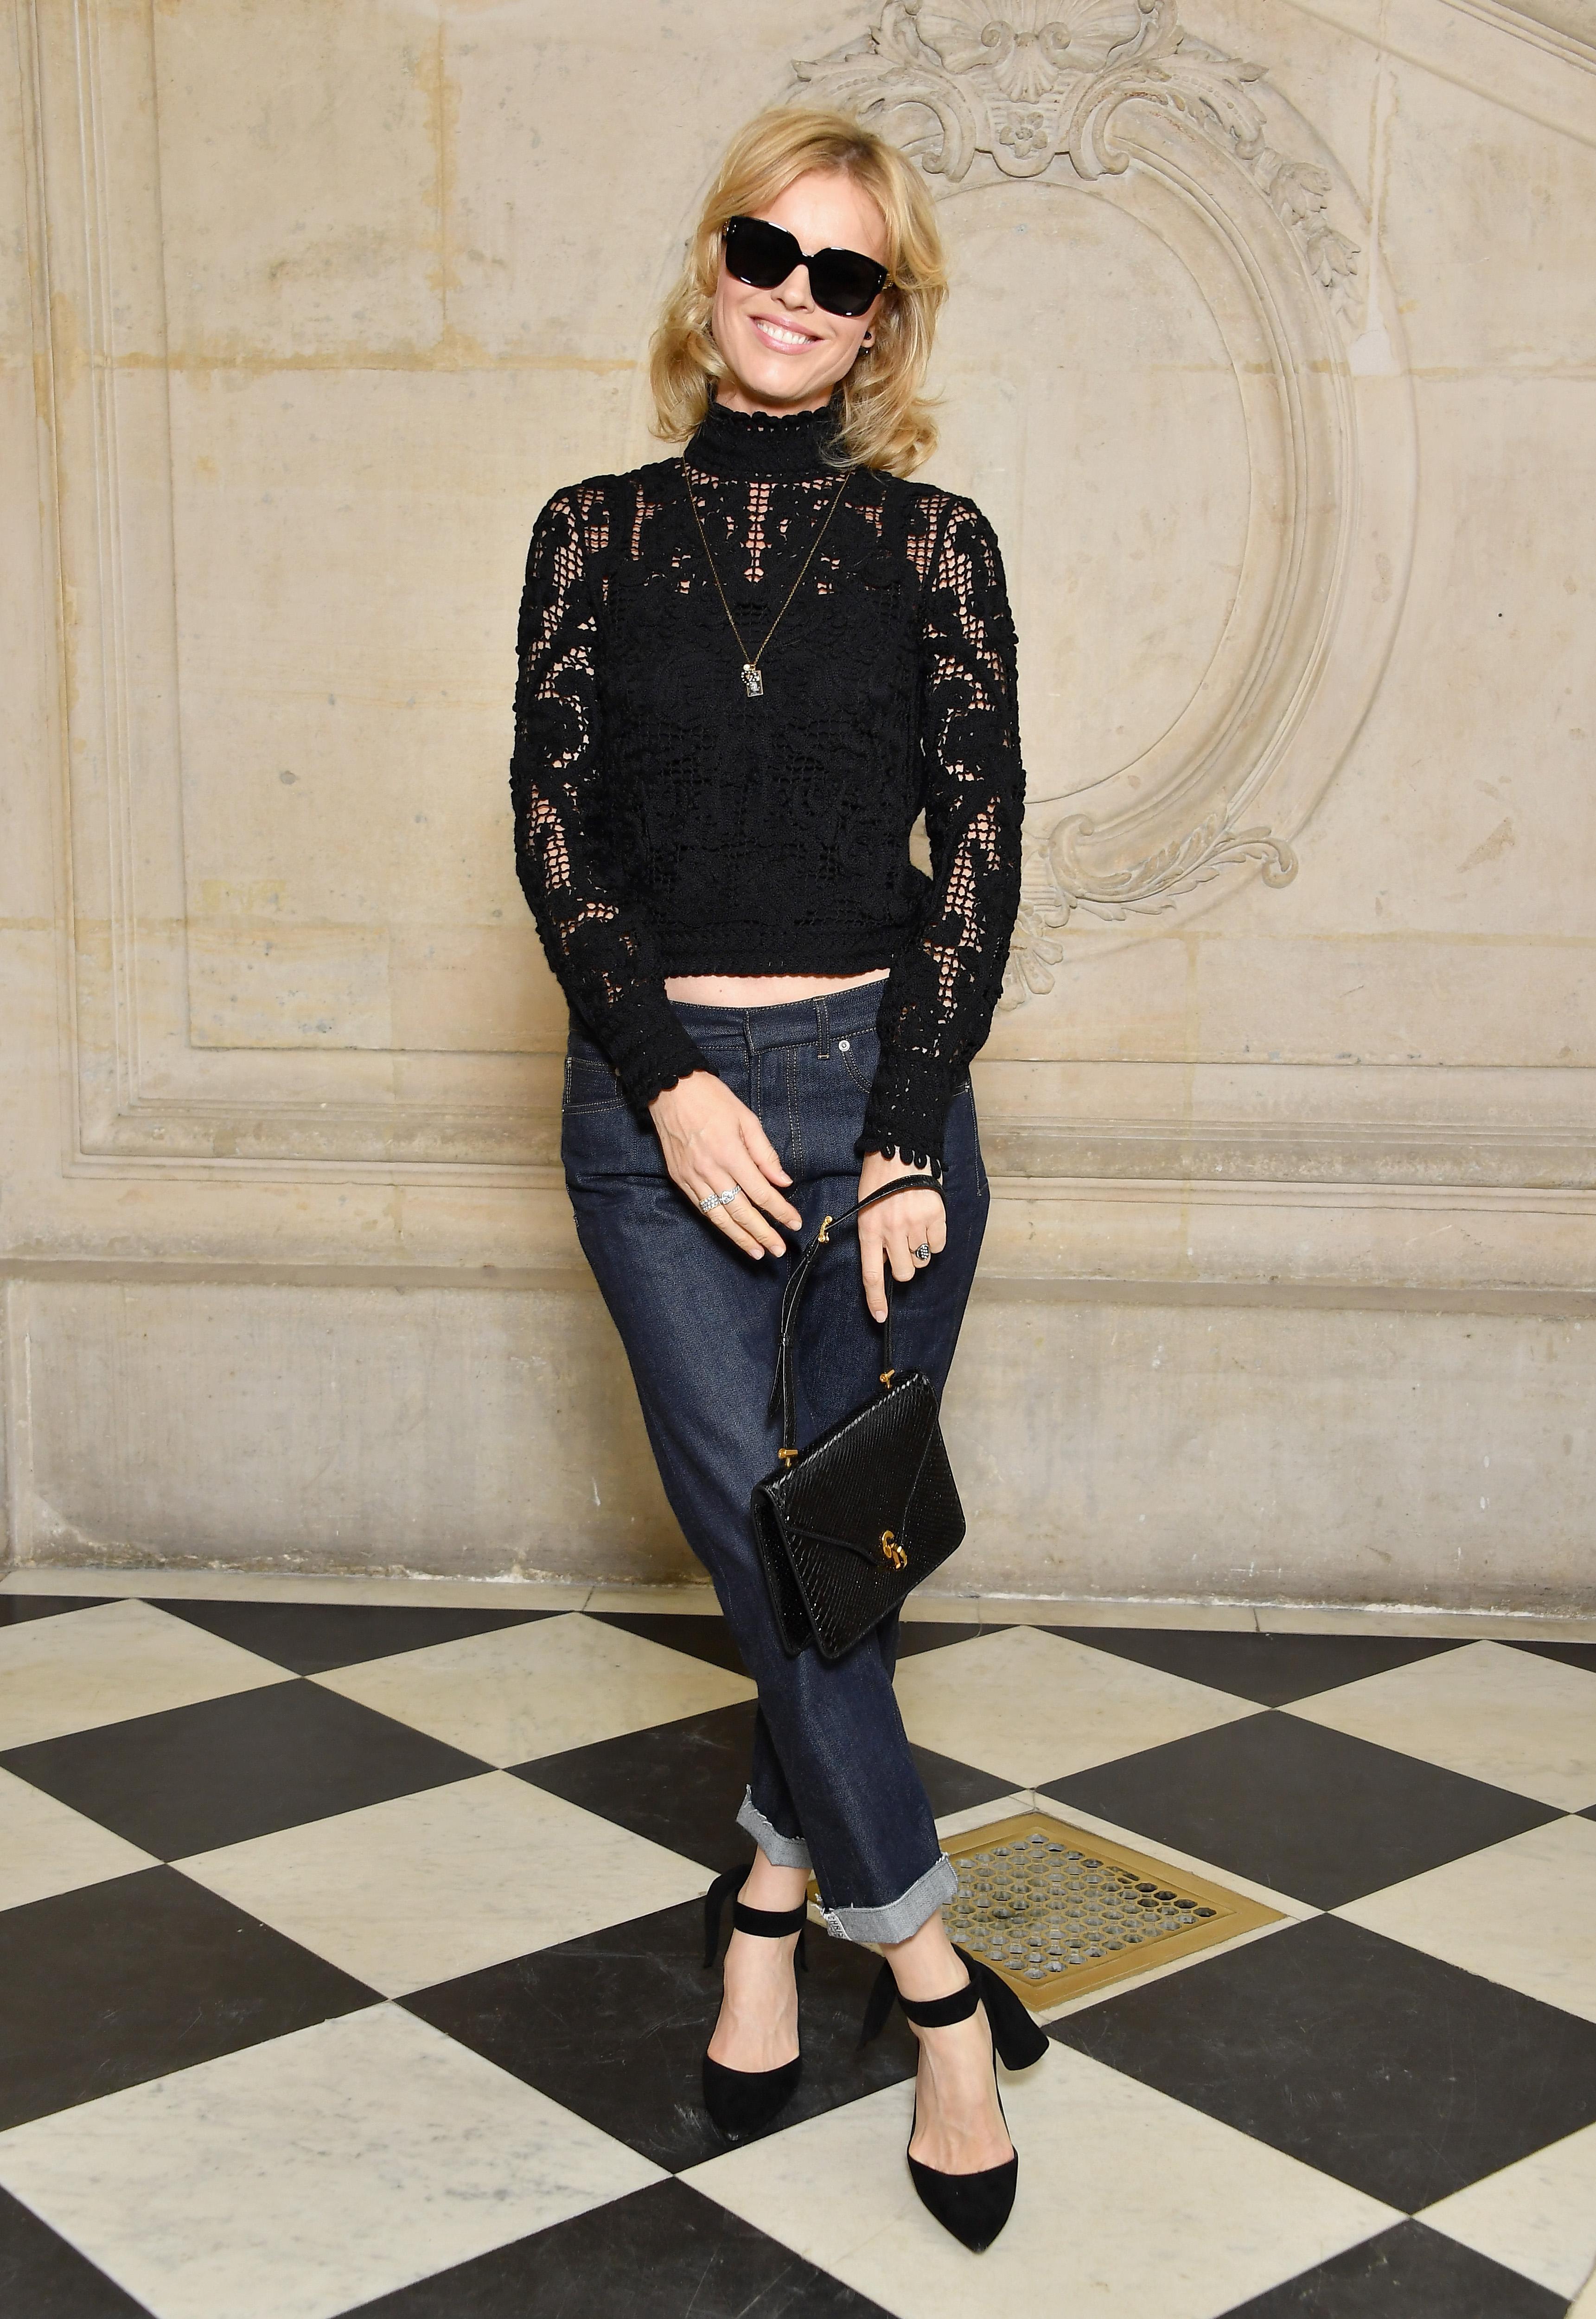 PARIS, FRANCE - SEPTEMBER 26: Eva Herzigova attends the Christian Dior show as part of the Paris Fashion Week Womenswear Spring/Summer 2018 on September 26, 2017 in Paris, France. (Photo by Pascal Le Segretain/Getty Images for Dior) *** Local Caption *** Eva Herzigova